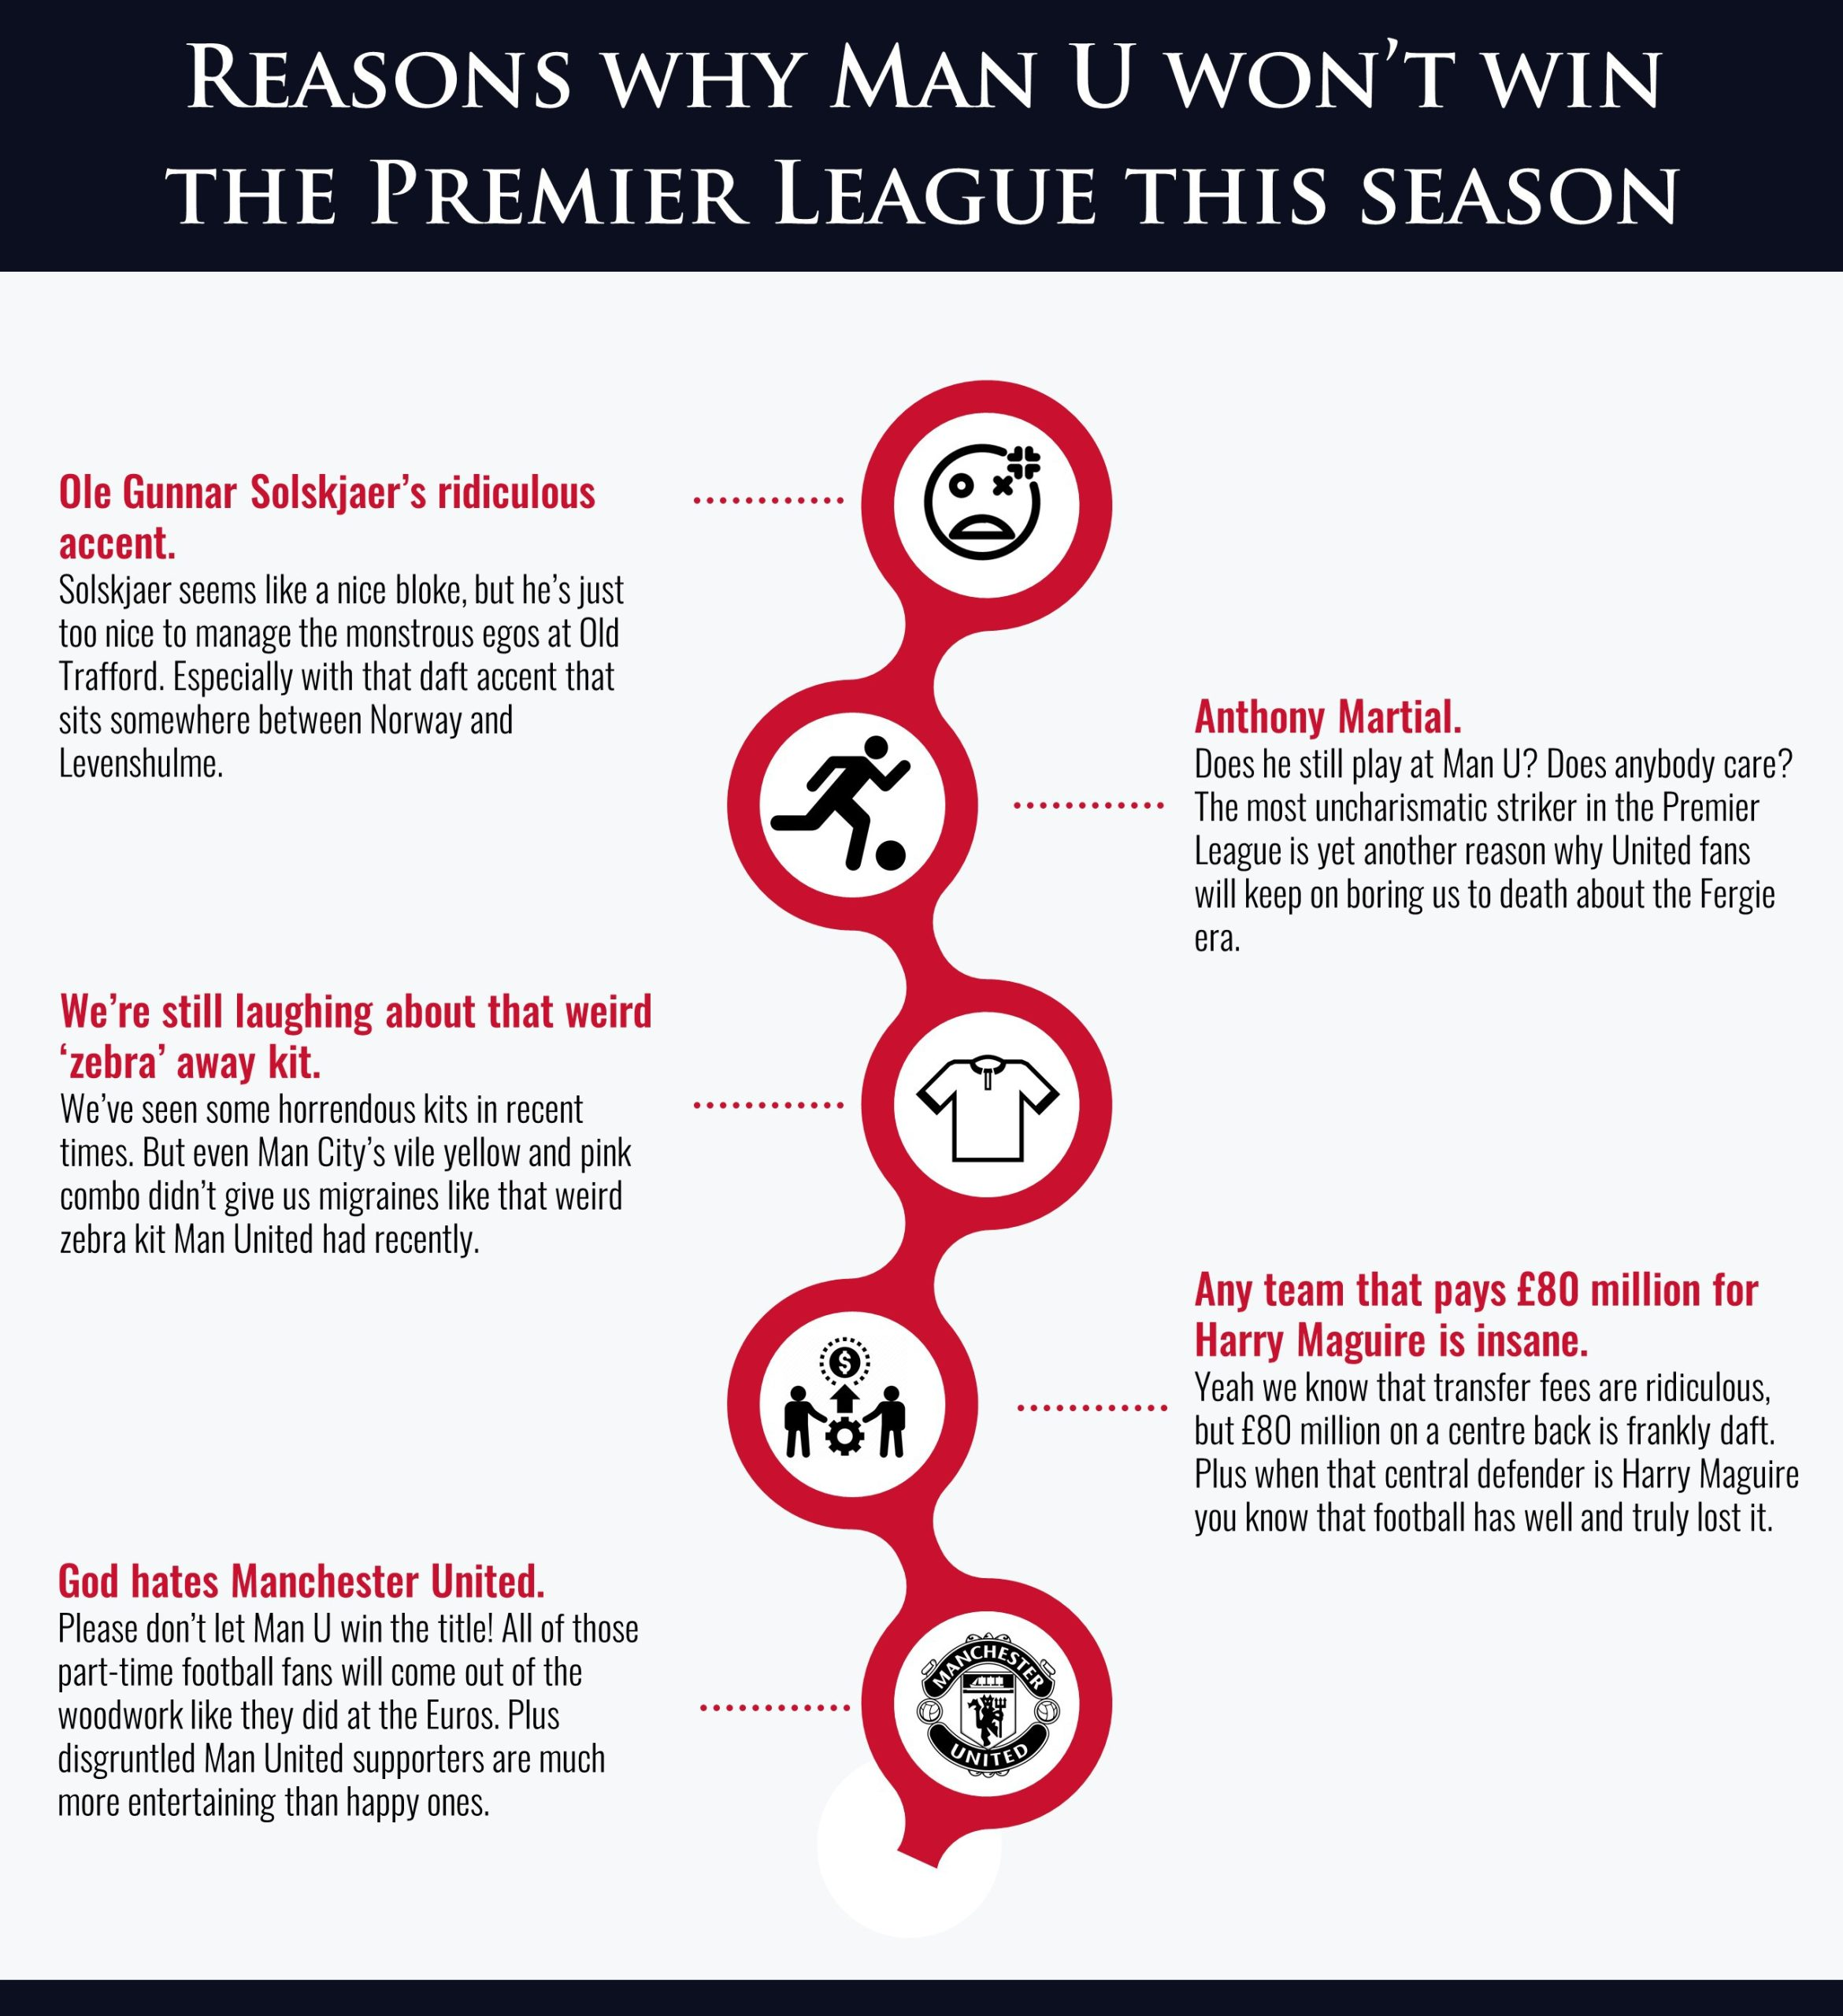 reasons man u won't win the league